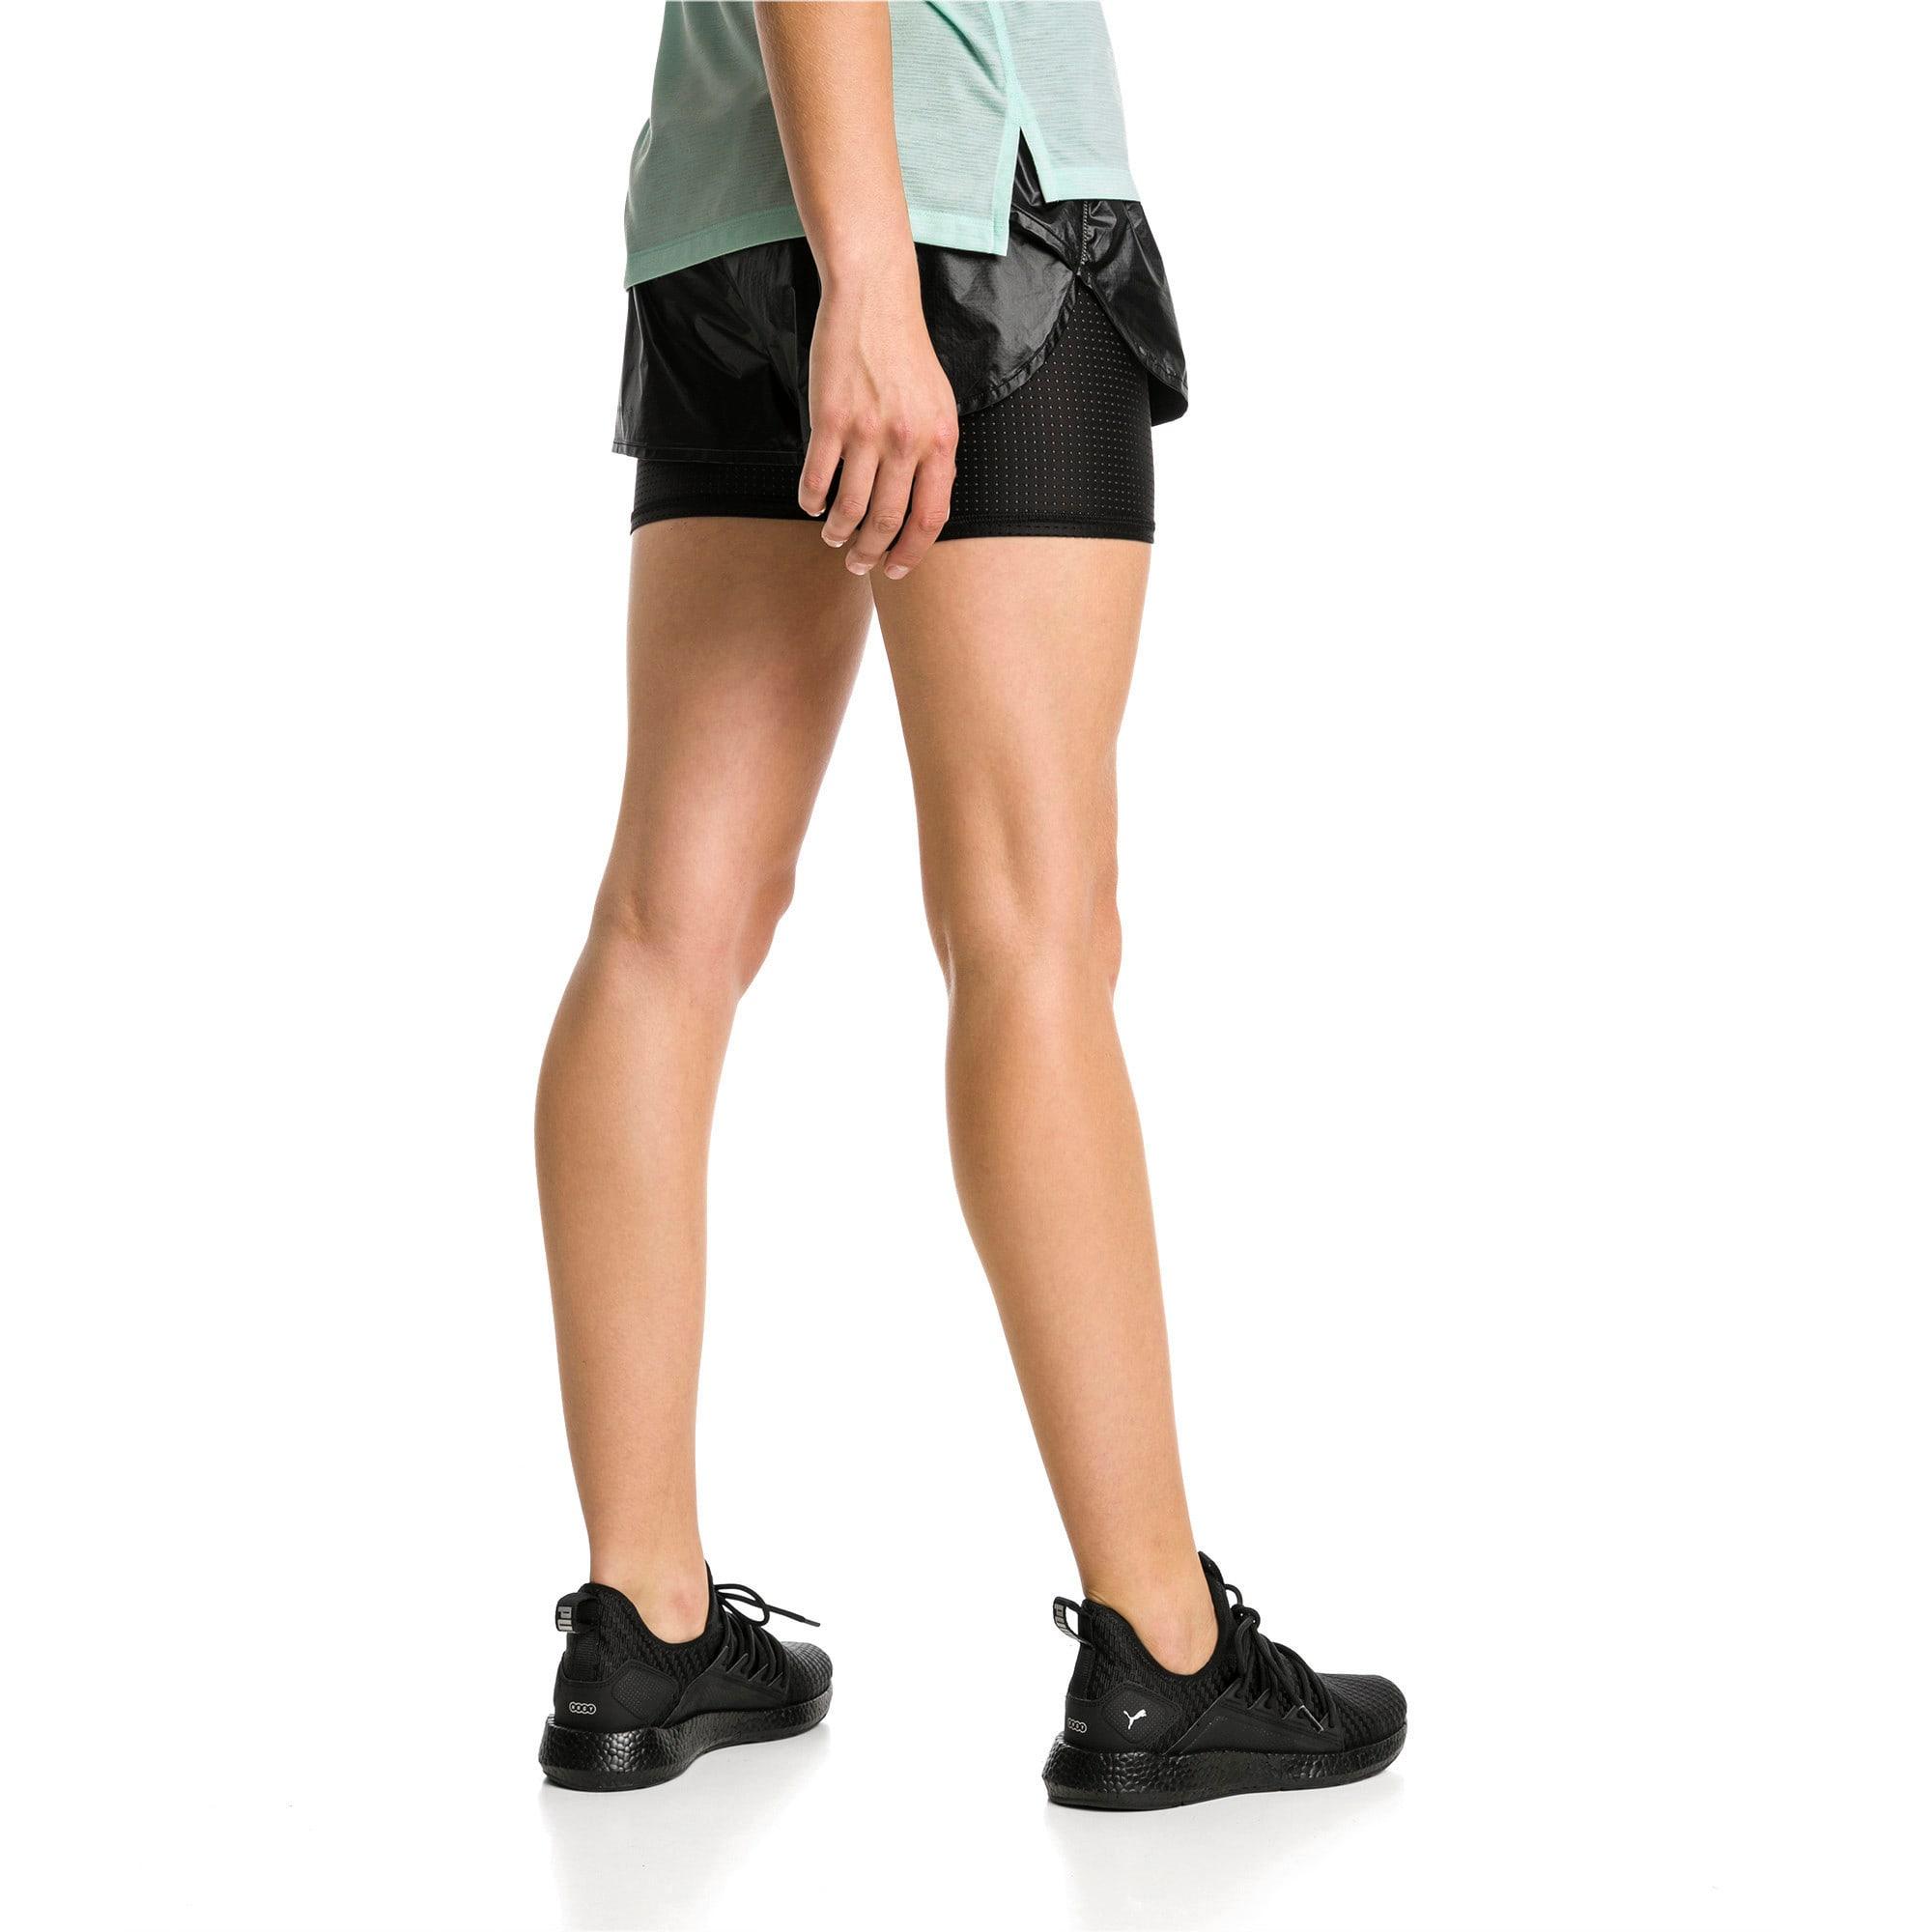 Thumbnail 3 of Blast Woven 2 in 1 Women's Running Shorts, Puma Black-metallic, medium-IND